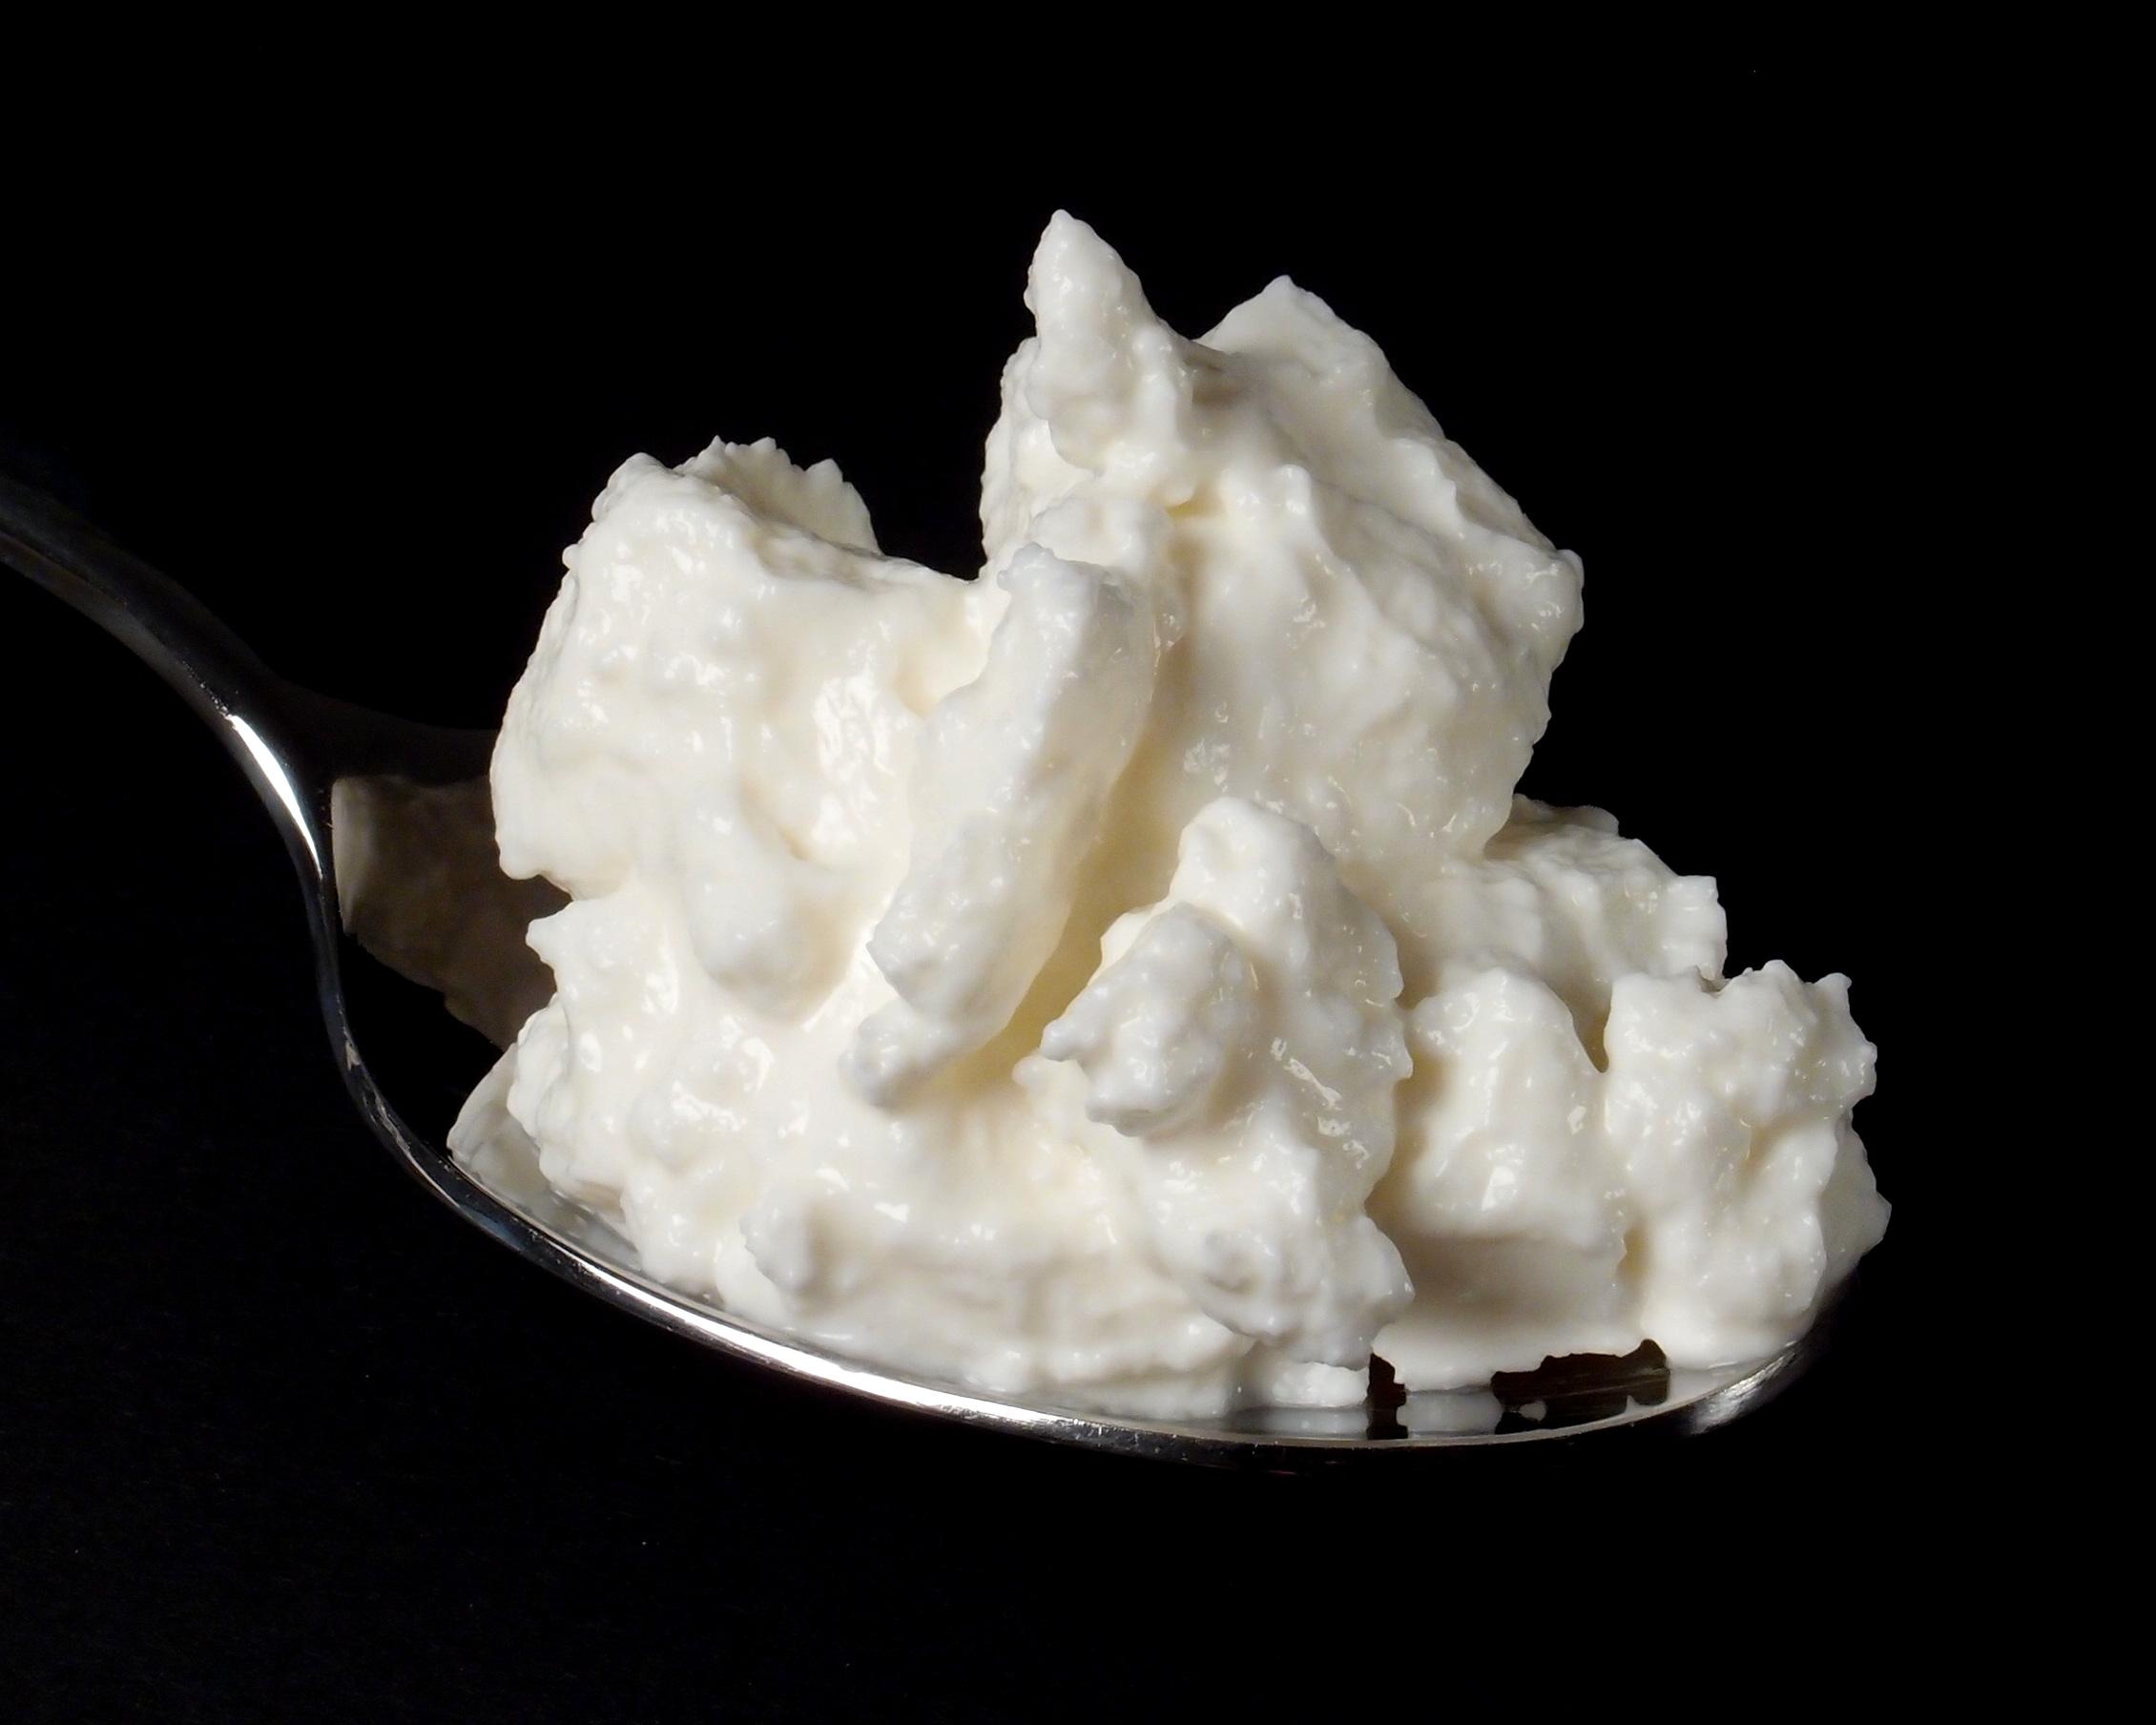 Skimmed_milk_quark_on_spoon